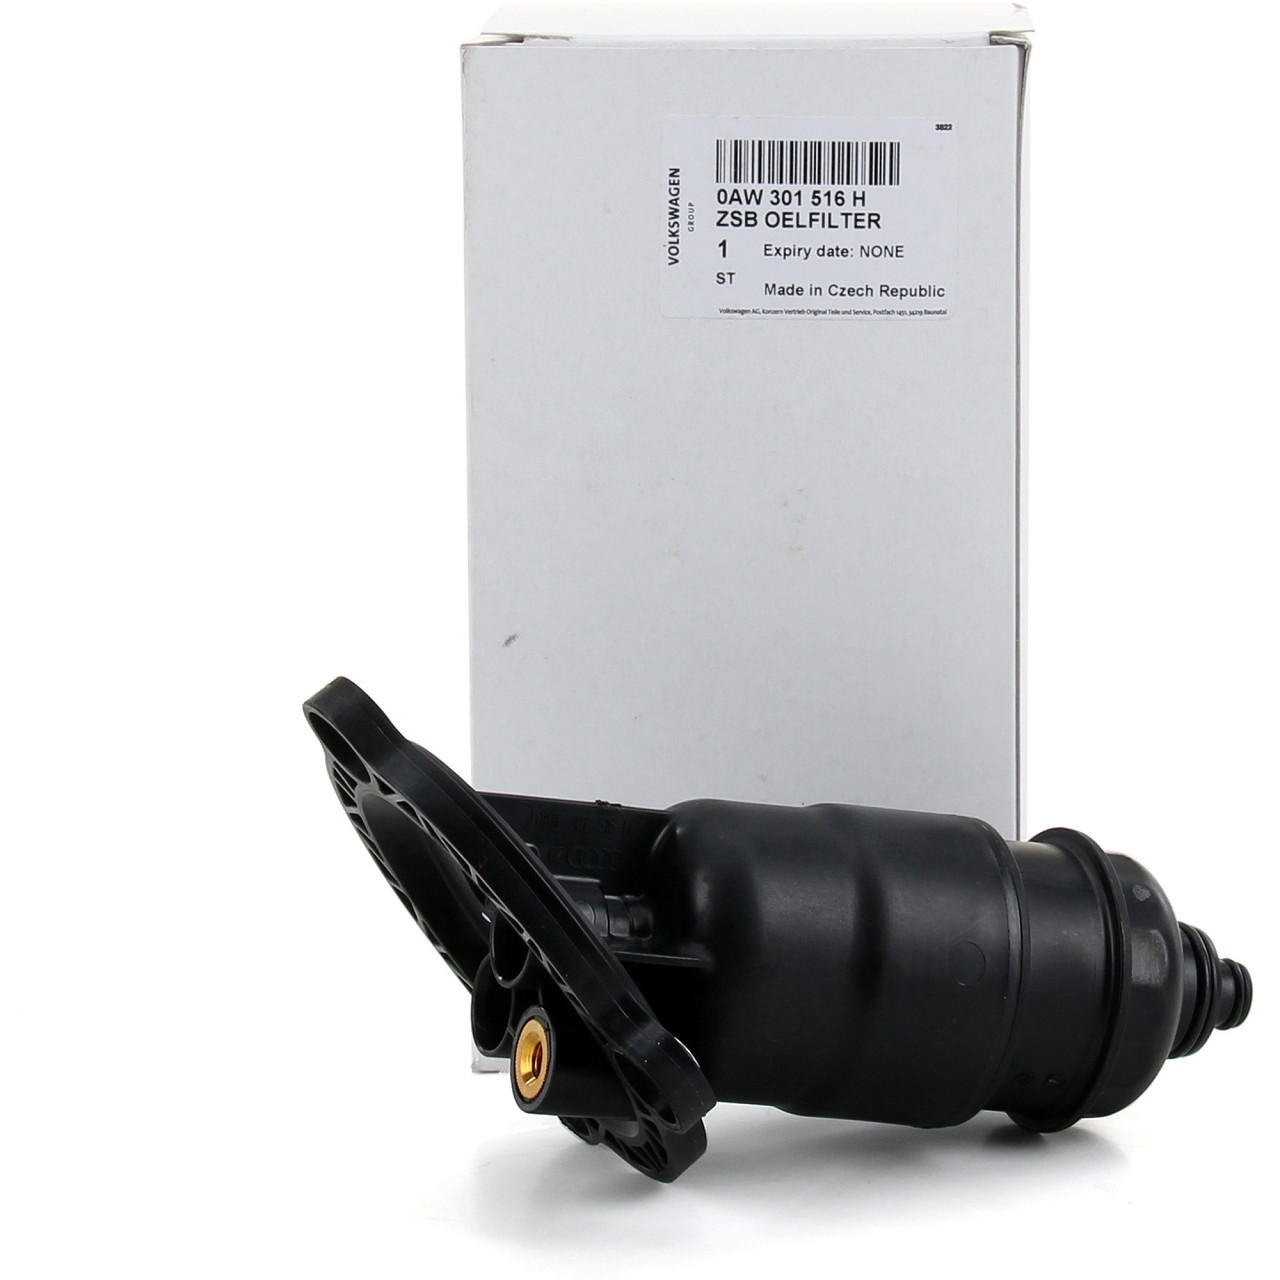 ORIGINAL Audi Getriebefilter A4 (8K B8) A5 (8T 8F) A6 A7 (4G C7) 0AW301516H